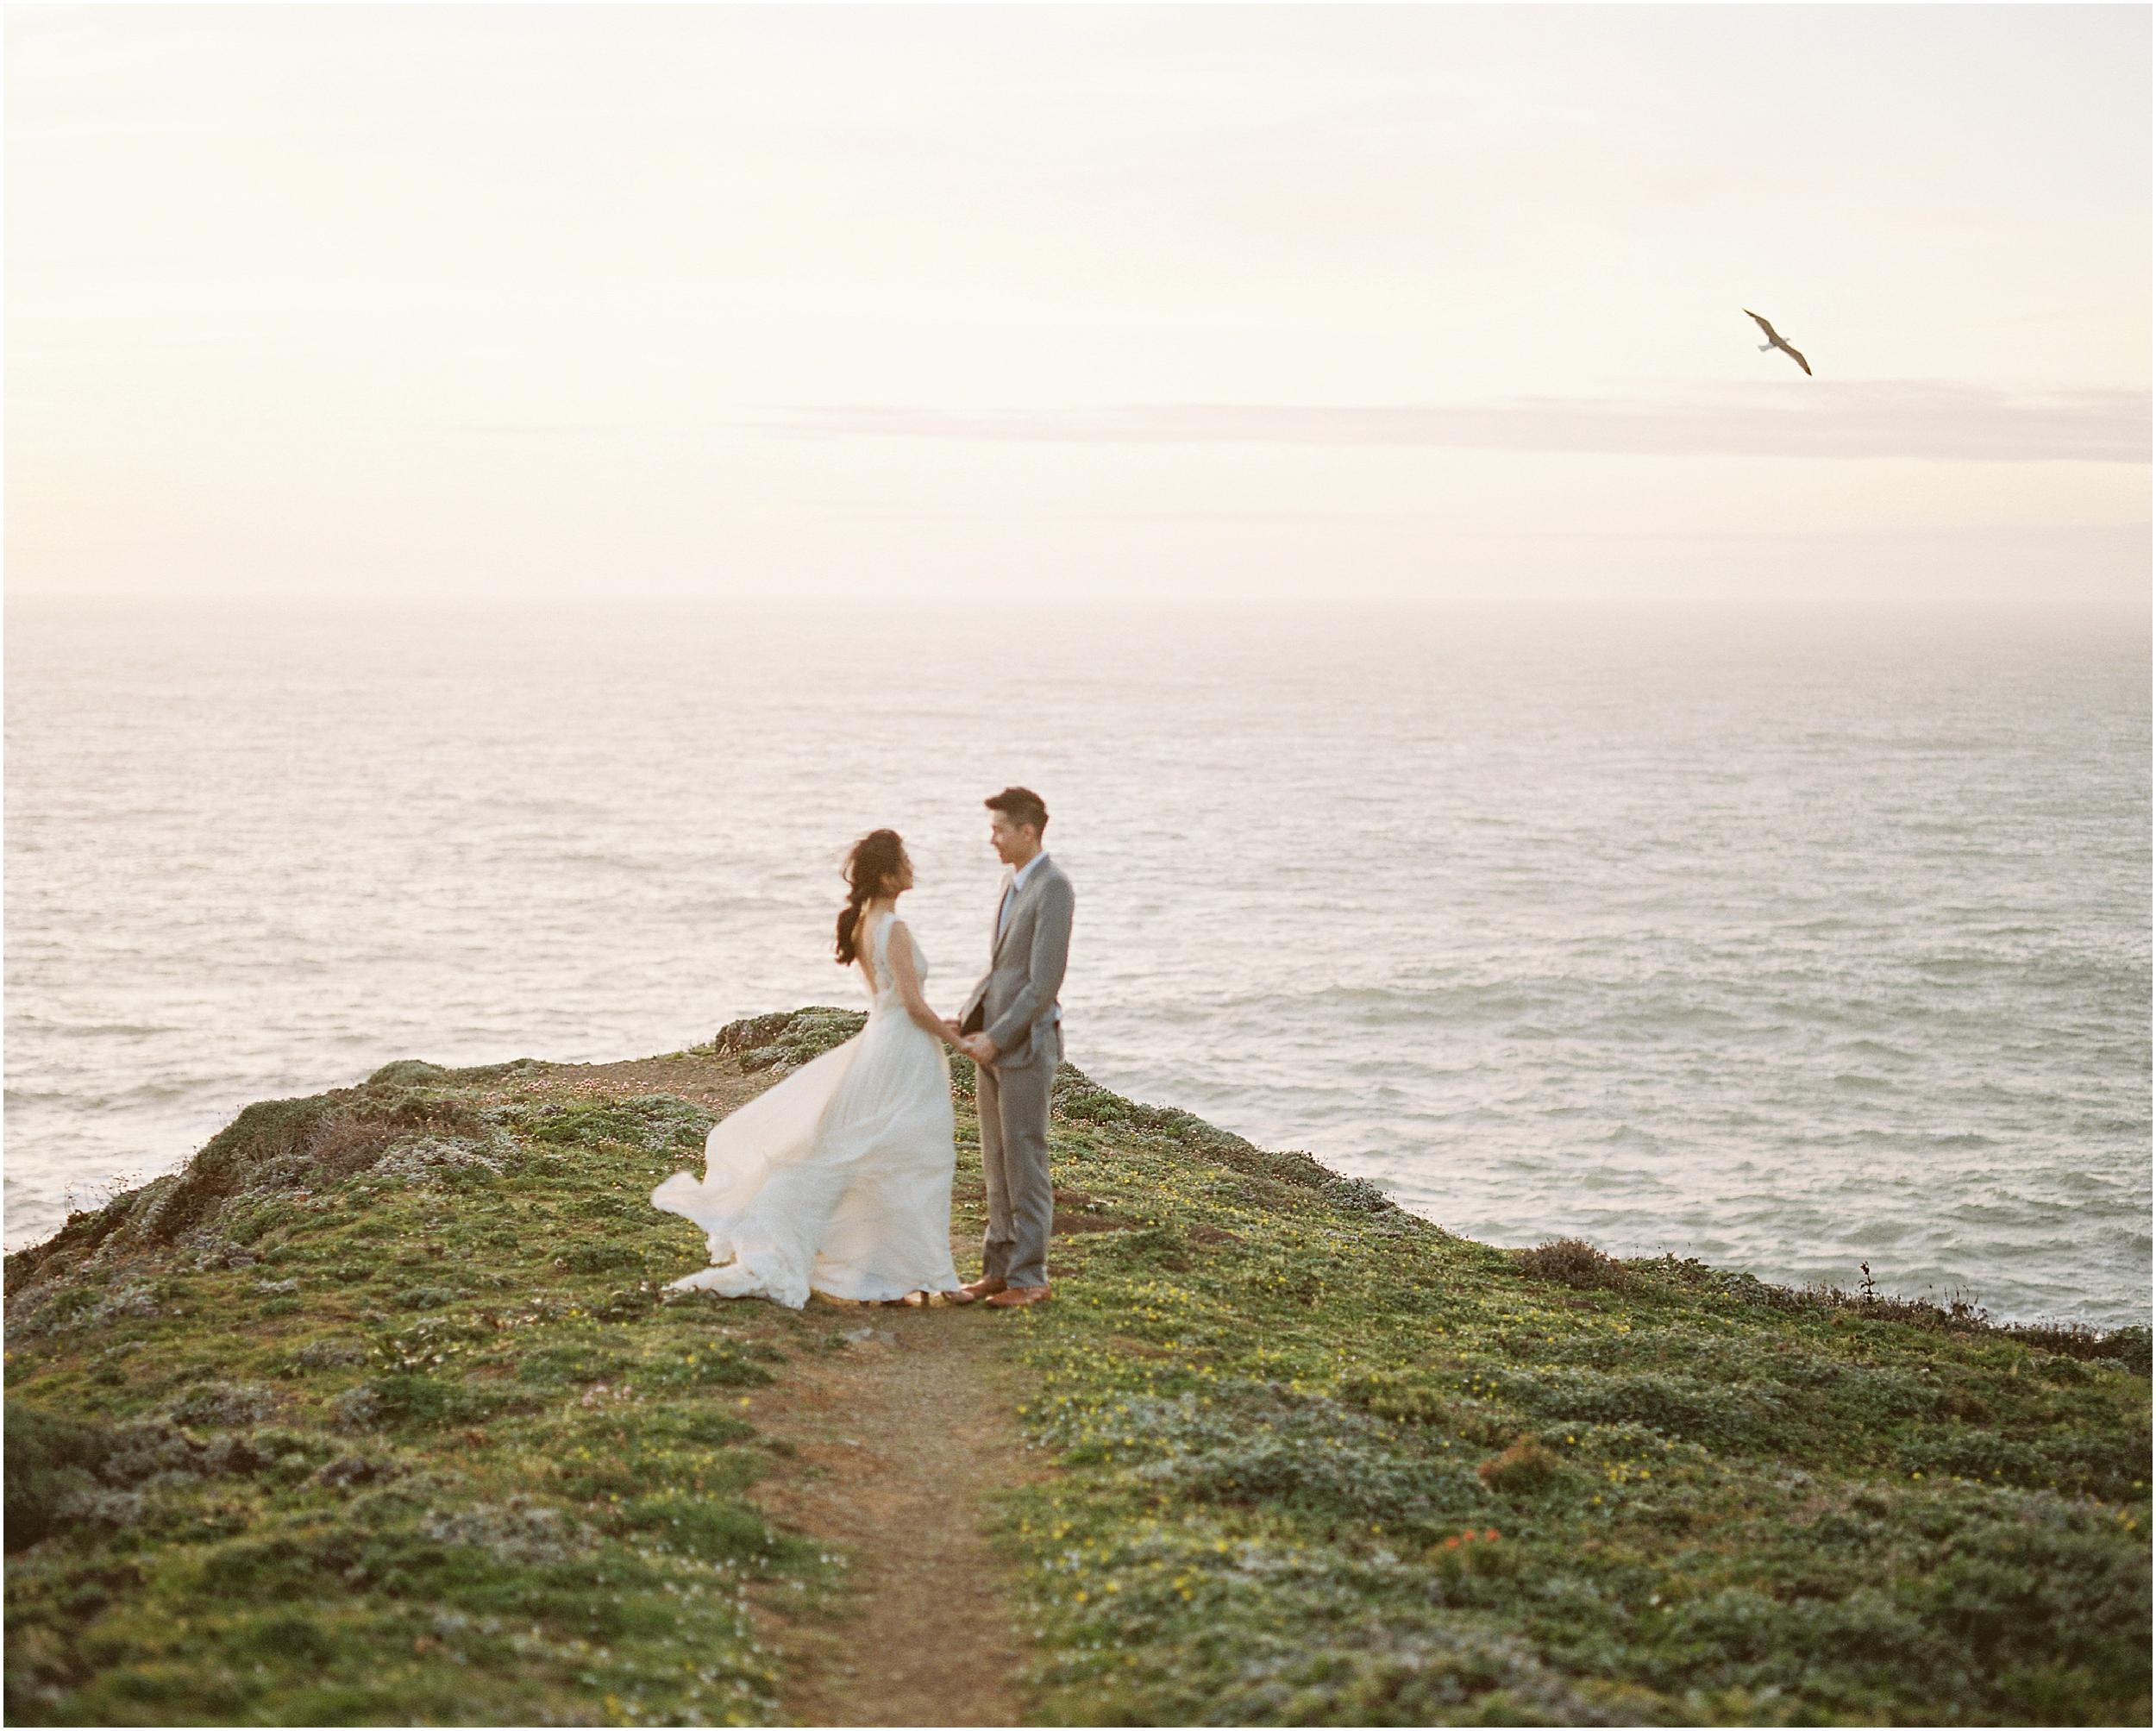 JeremiahRachelPhotography_GreenwoodEvents_CuffeysCove_ElopementWedding_Elk_California0030.JPG